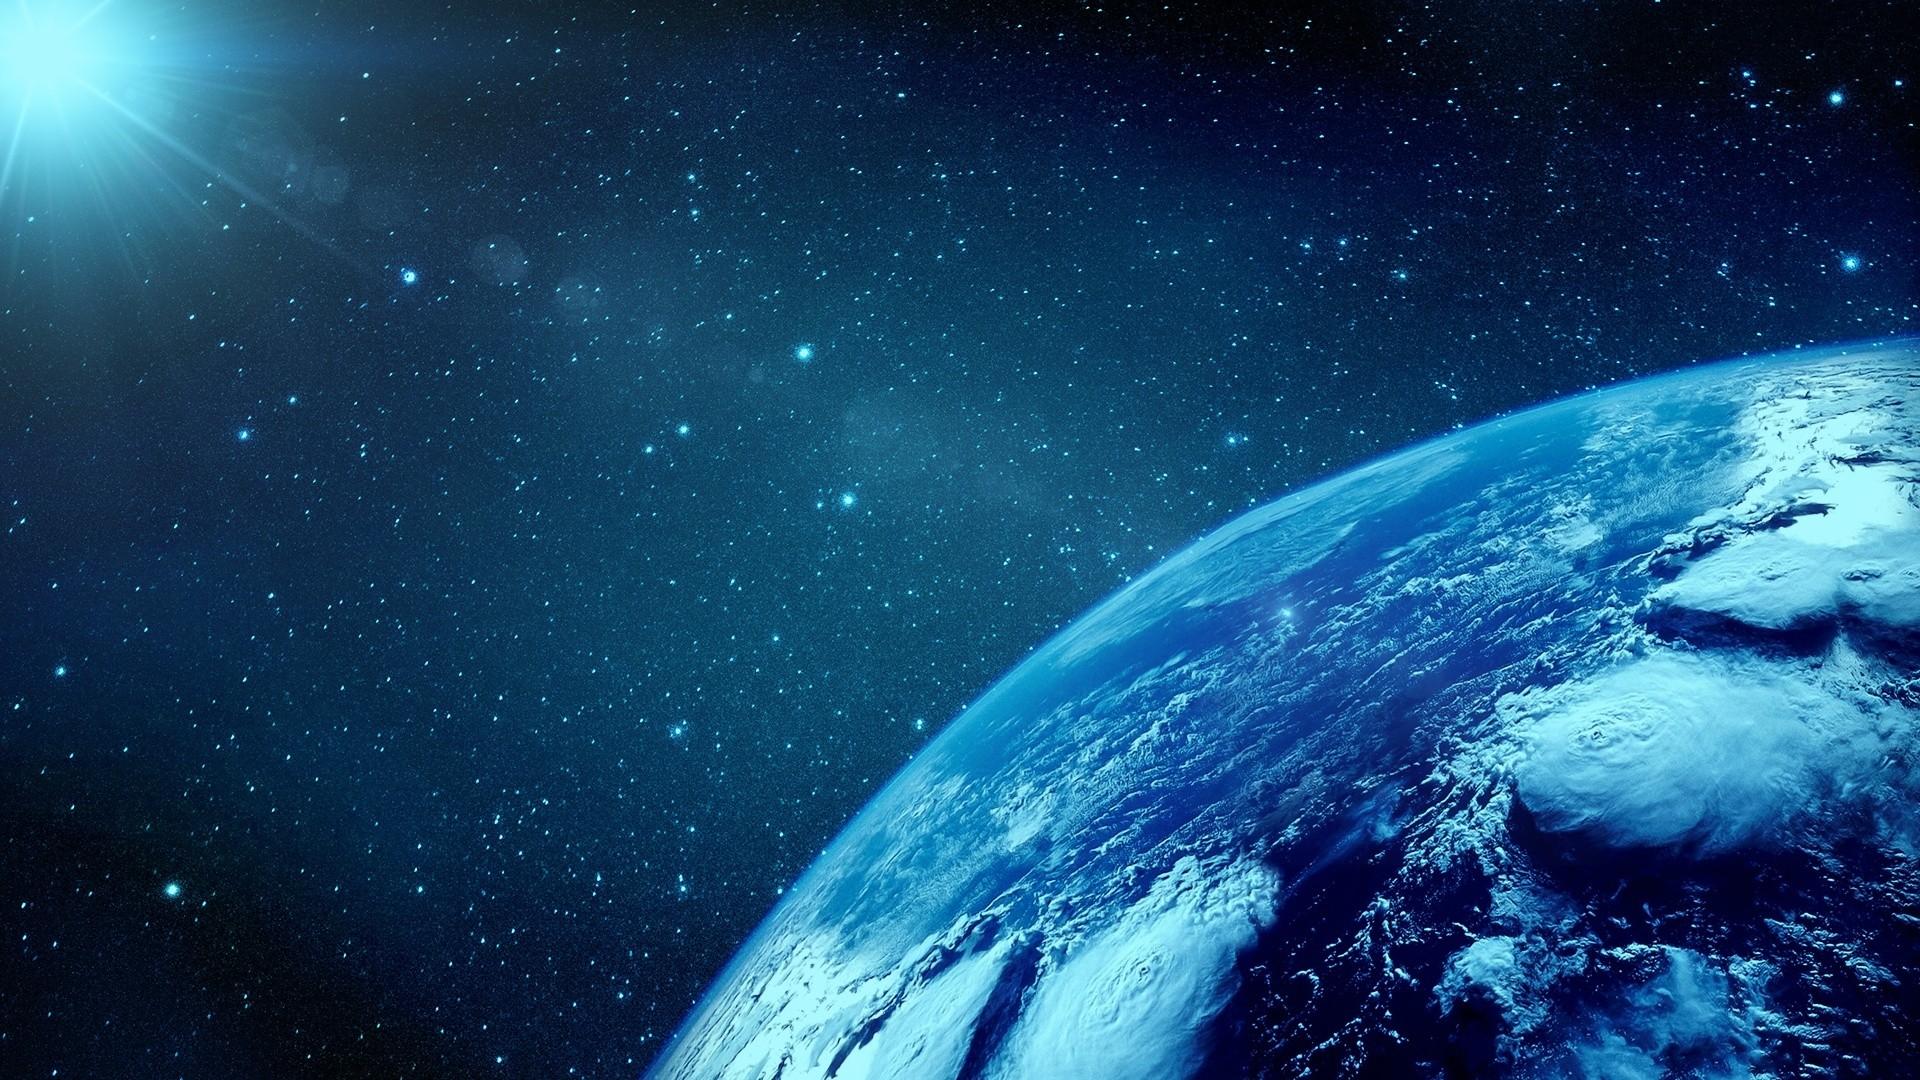 Wallpaper Planit Ruang Bumi Suasana Alam Semesta Atmosfer Bumi Luar Angkasa Obyek Astronomi 1920x1080 Ludendorf 22890 Hd Wallpapers Wallhere